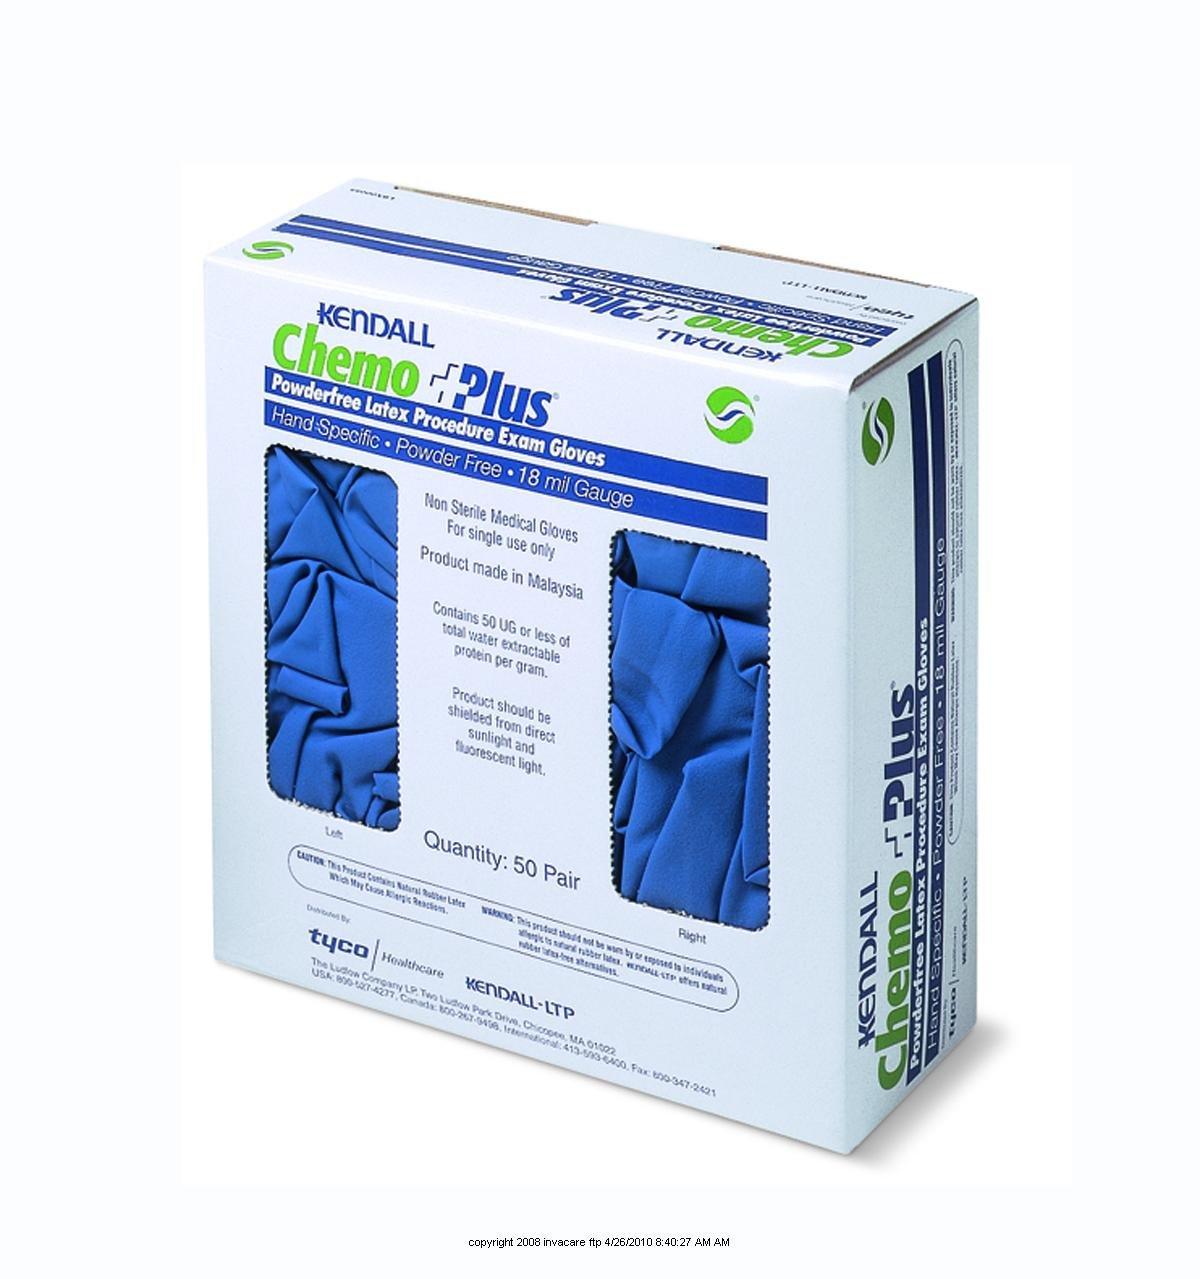 Chemoplus Non-Sterile Neoprene Gloves sm -SP, Chemo Pl Neoprene Glv Sm -Ns, (1 CASE, 300 EACH)